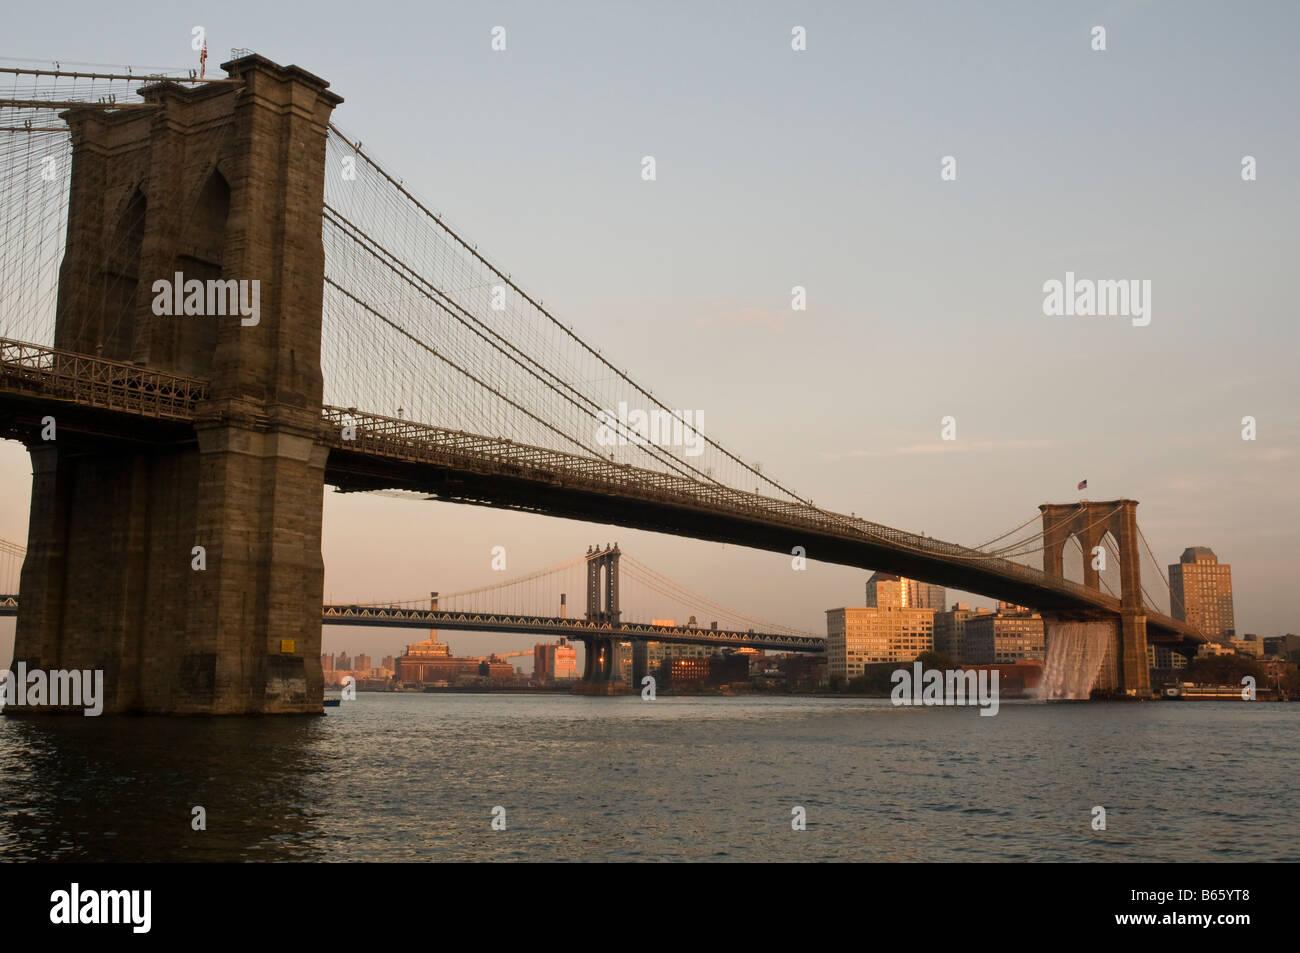 Brooklyn Bridge and New York City Waterfalls art project by Danish artist Olafur Eliasson at dusk New York USA Stock Photo